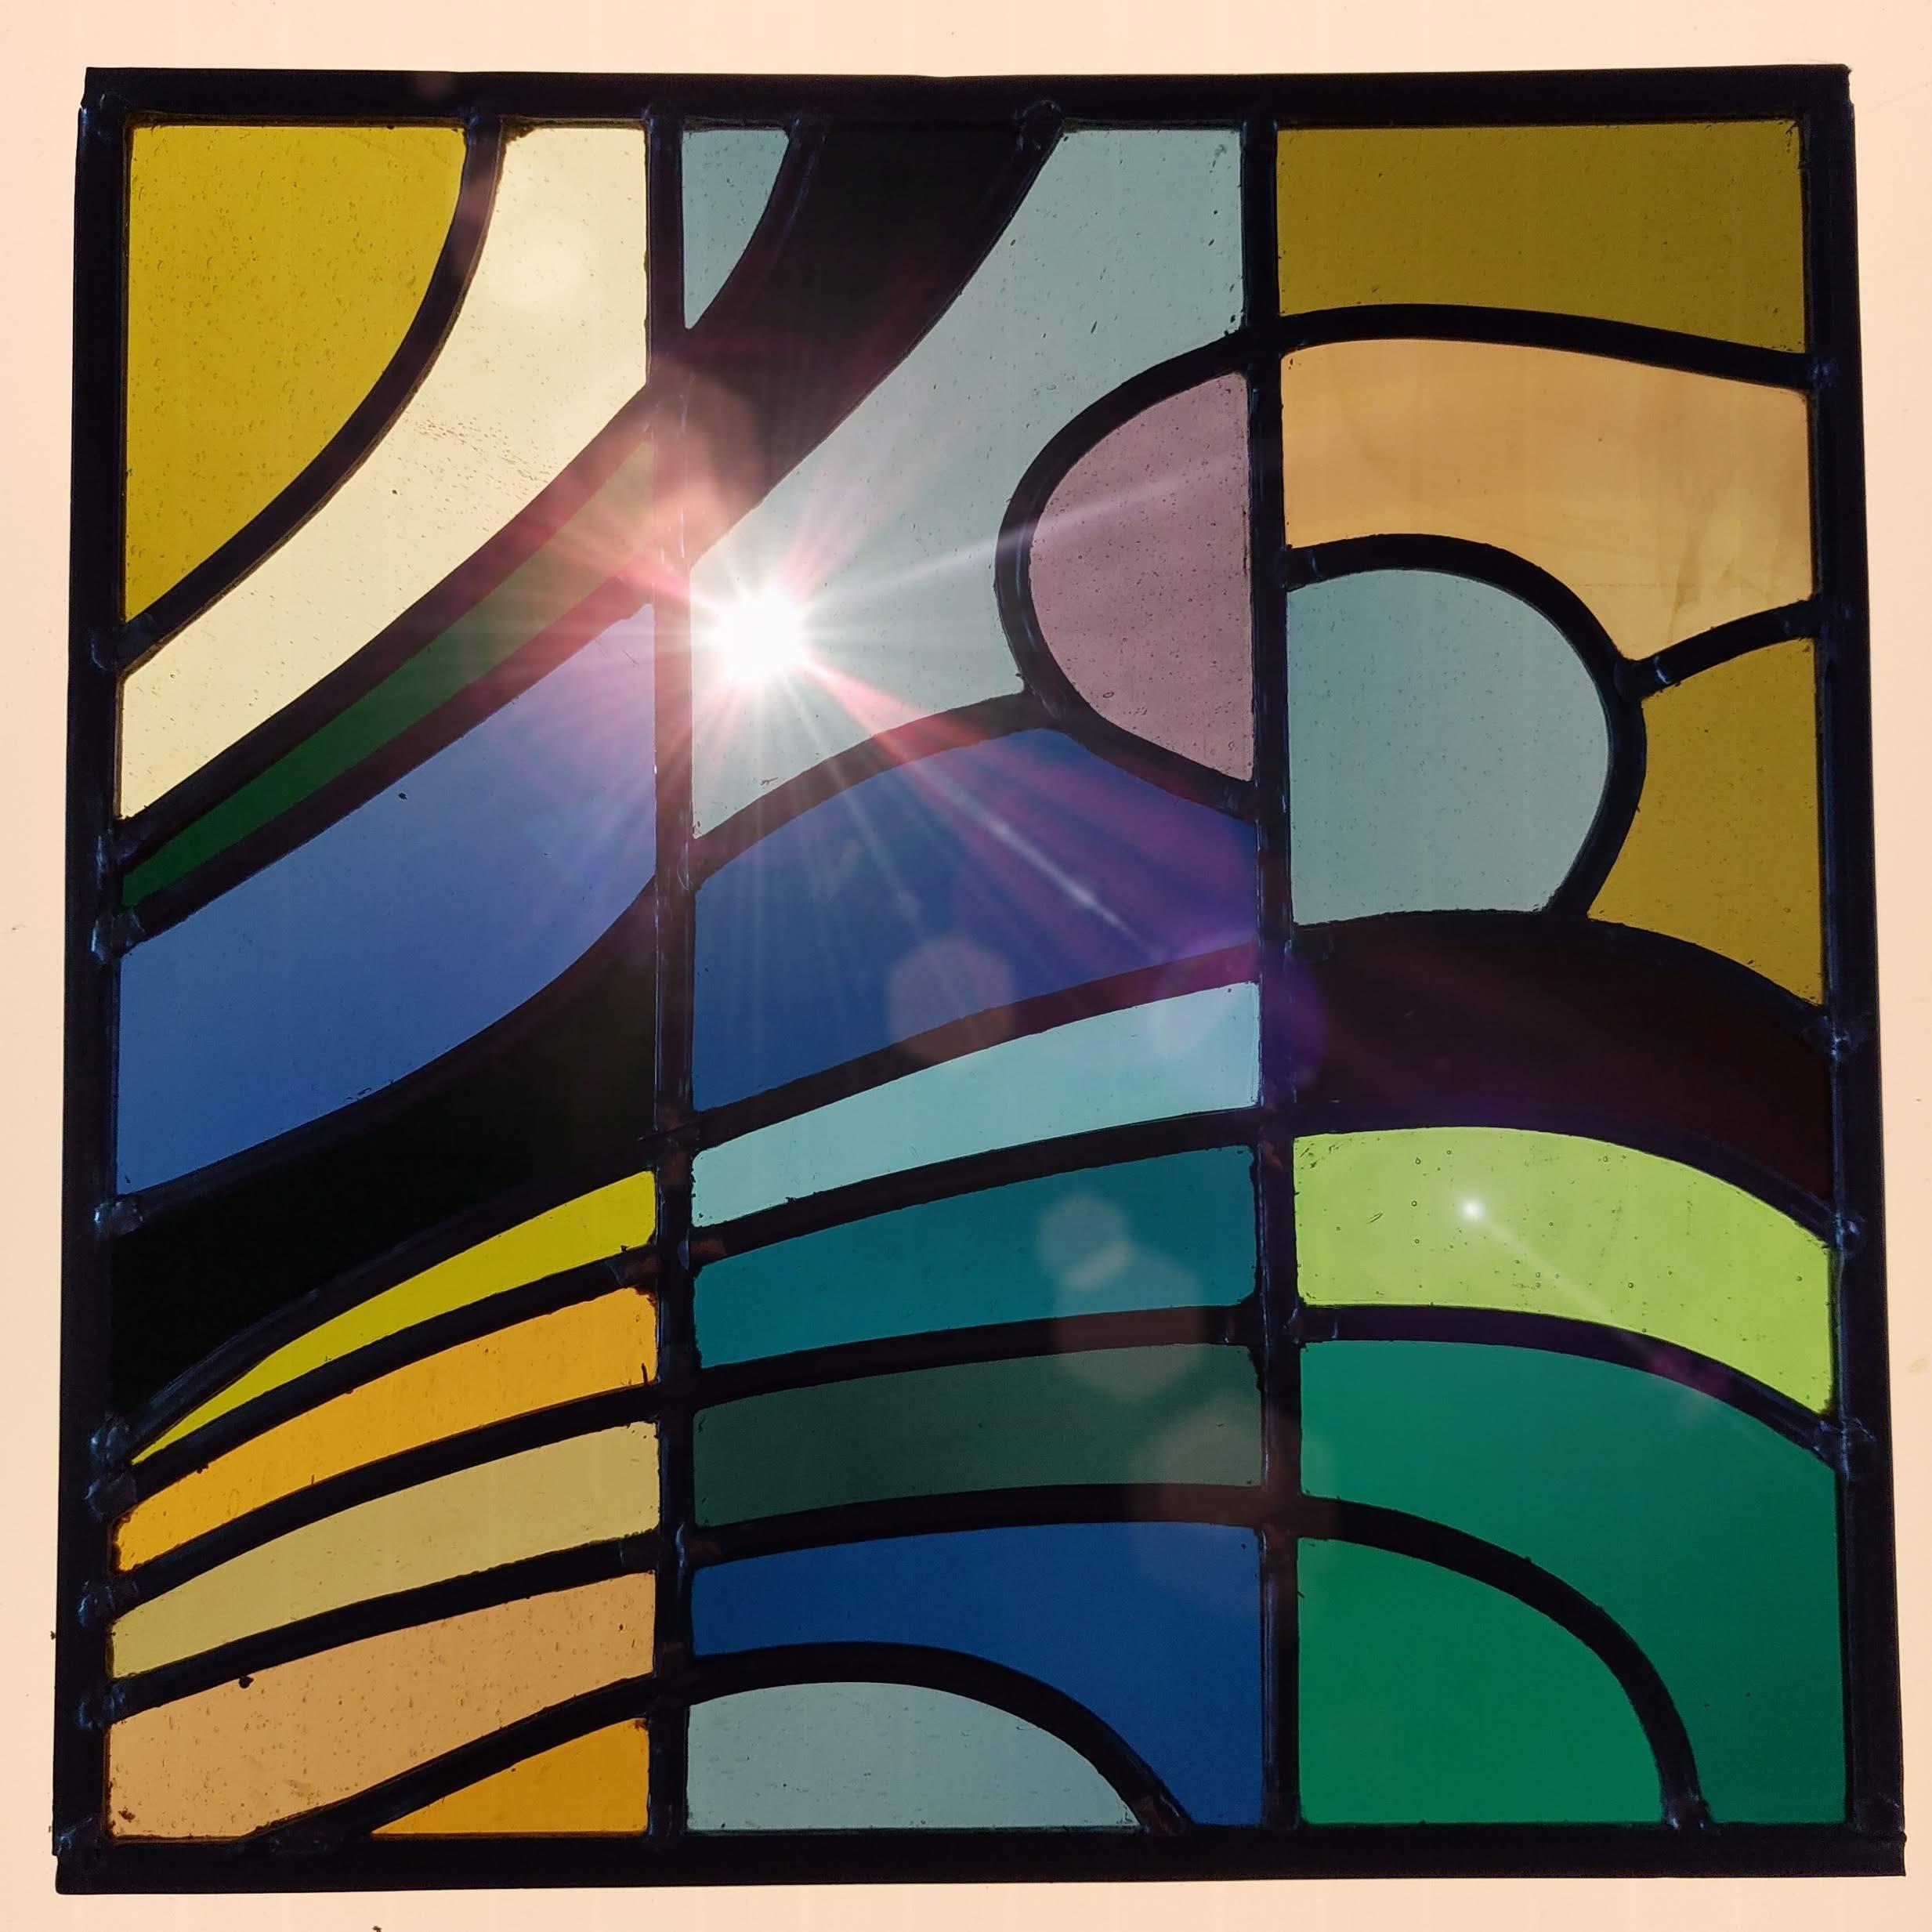 glasraam glas-in-lood Isabelle Decallonne glasraamkunst